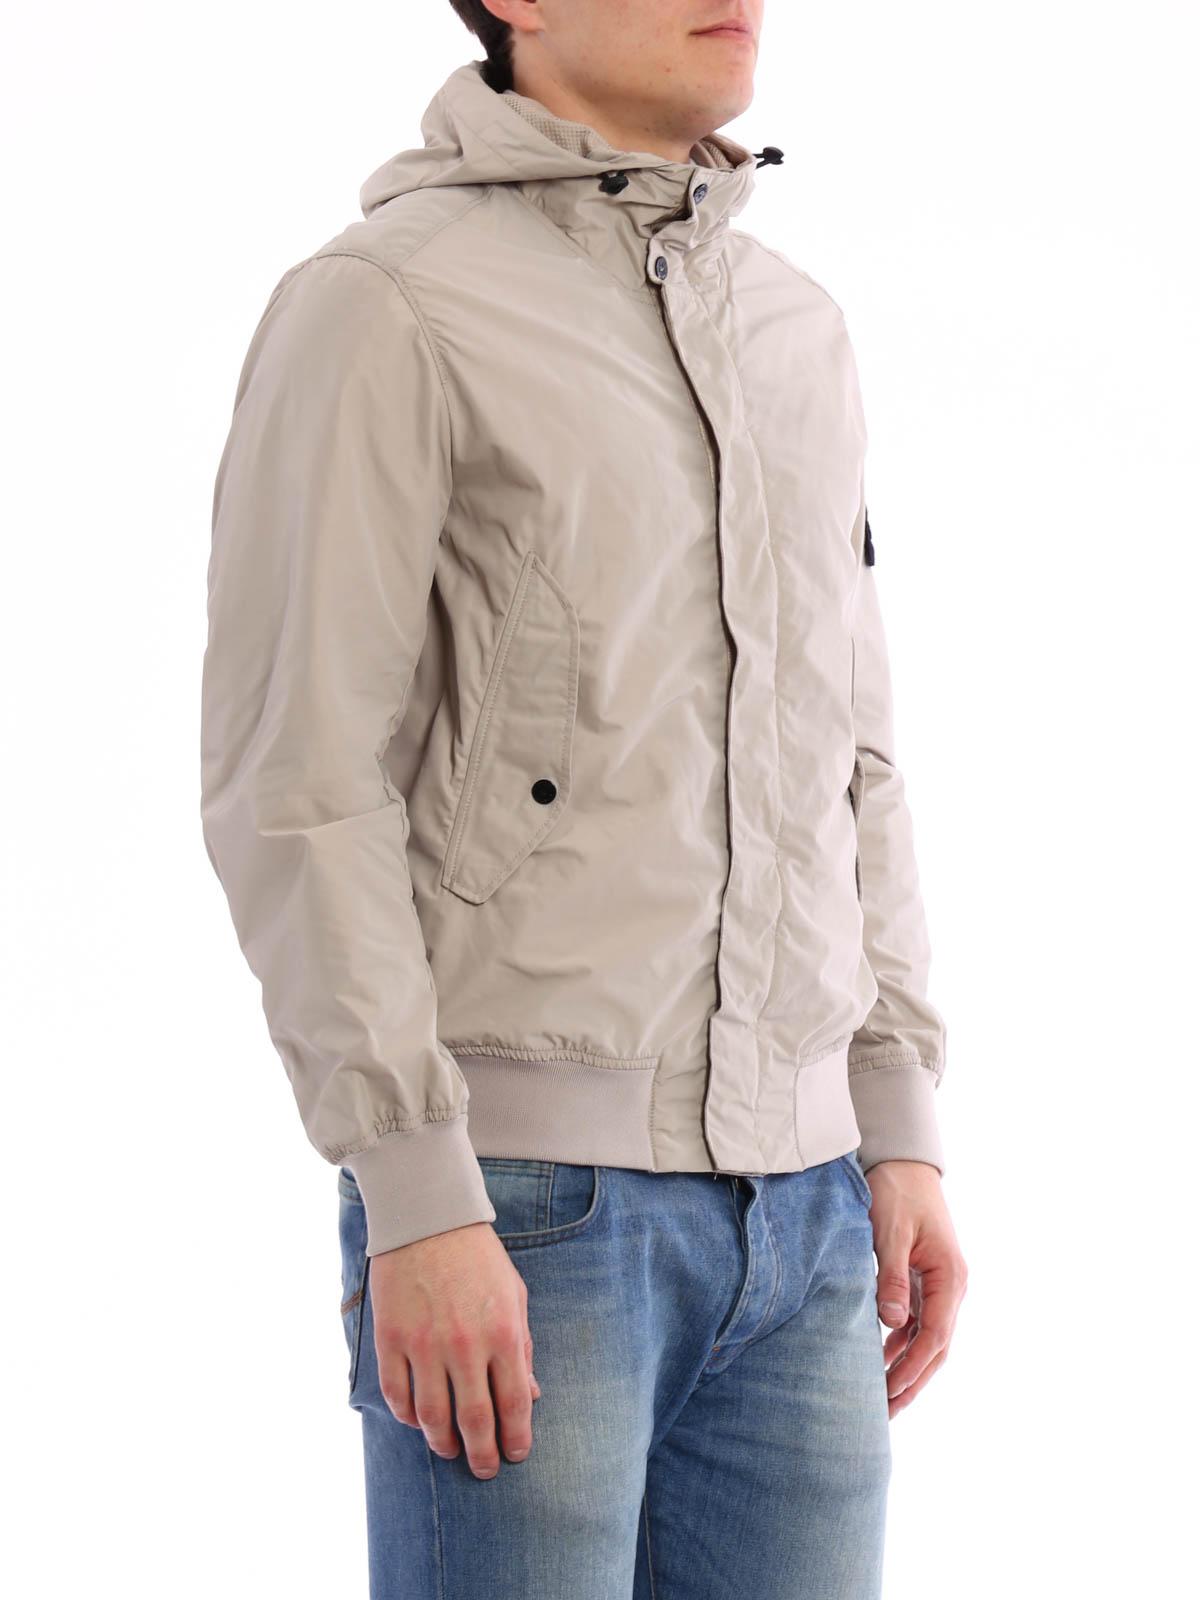 Waterproof hooded jacket by Stone Island - casual jackets - iKRIX